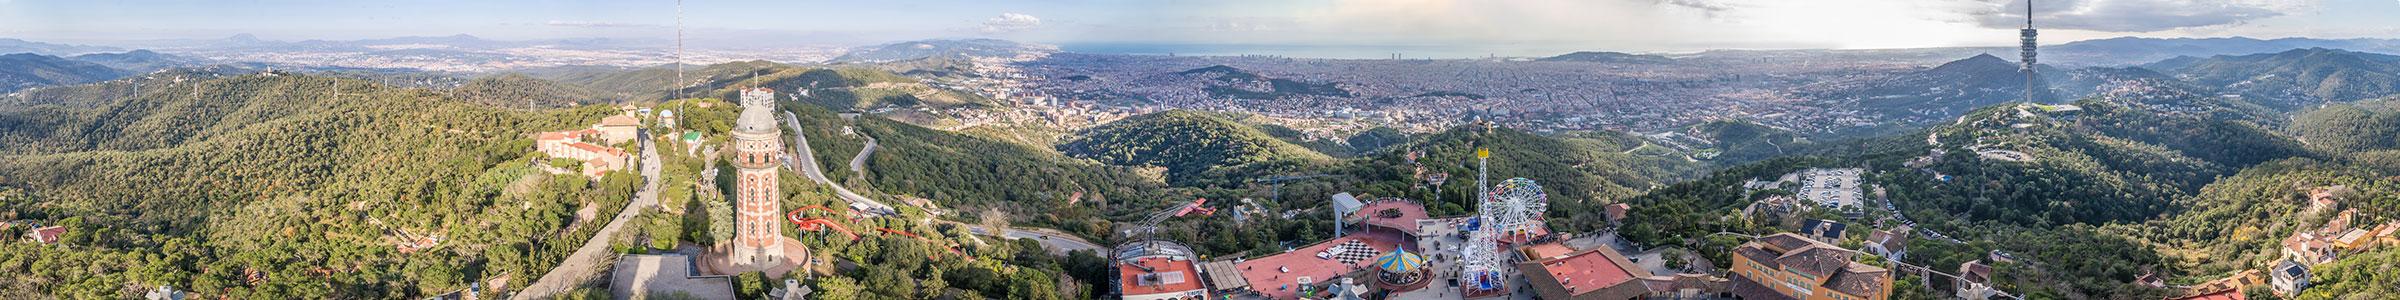 Barcelona Tibidabo - Blick von der Kirche Sagrat Cor auf Barcelona